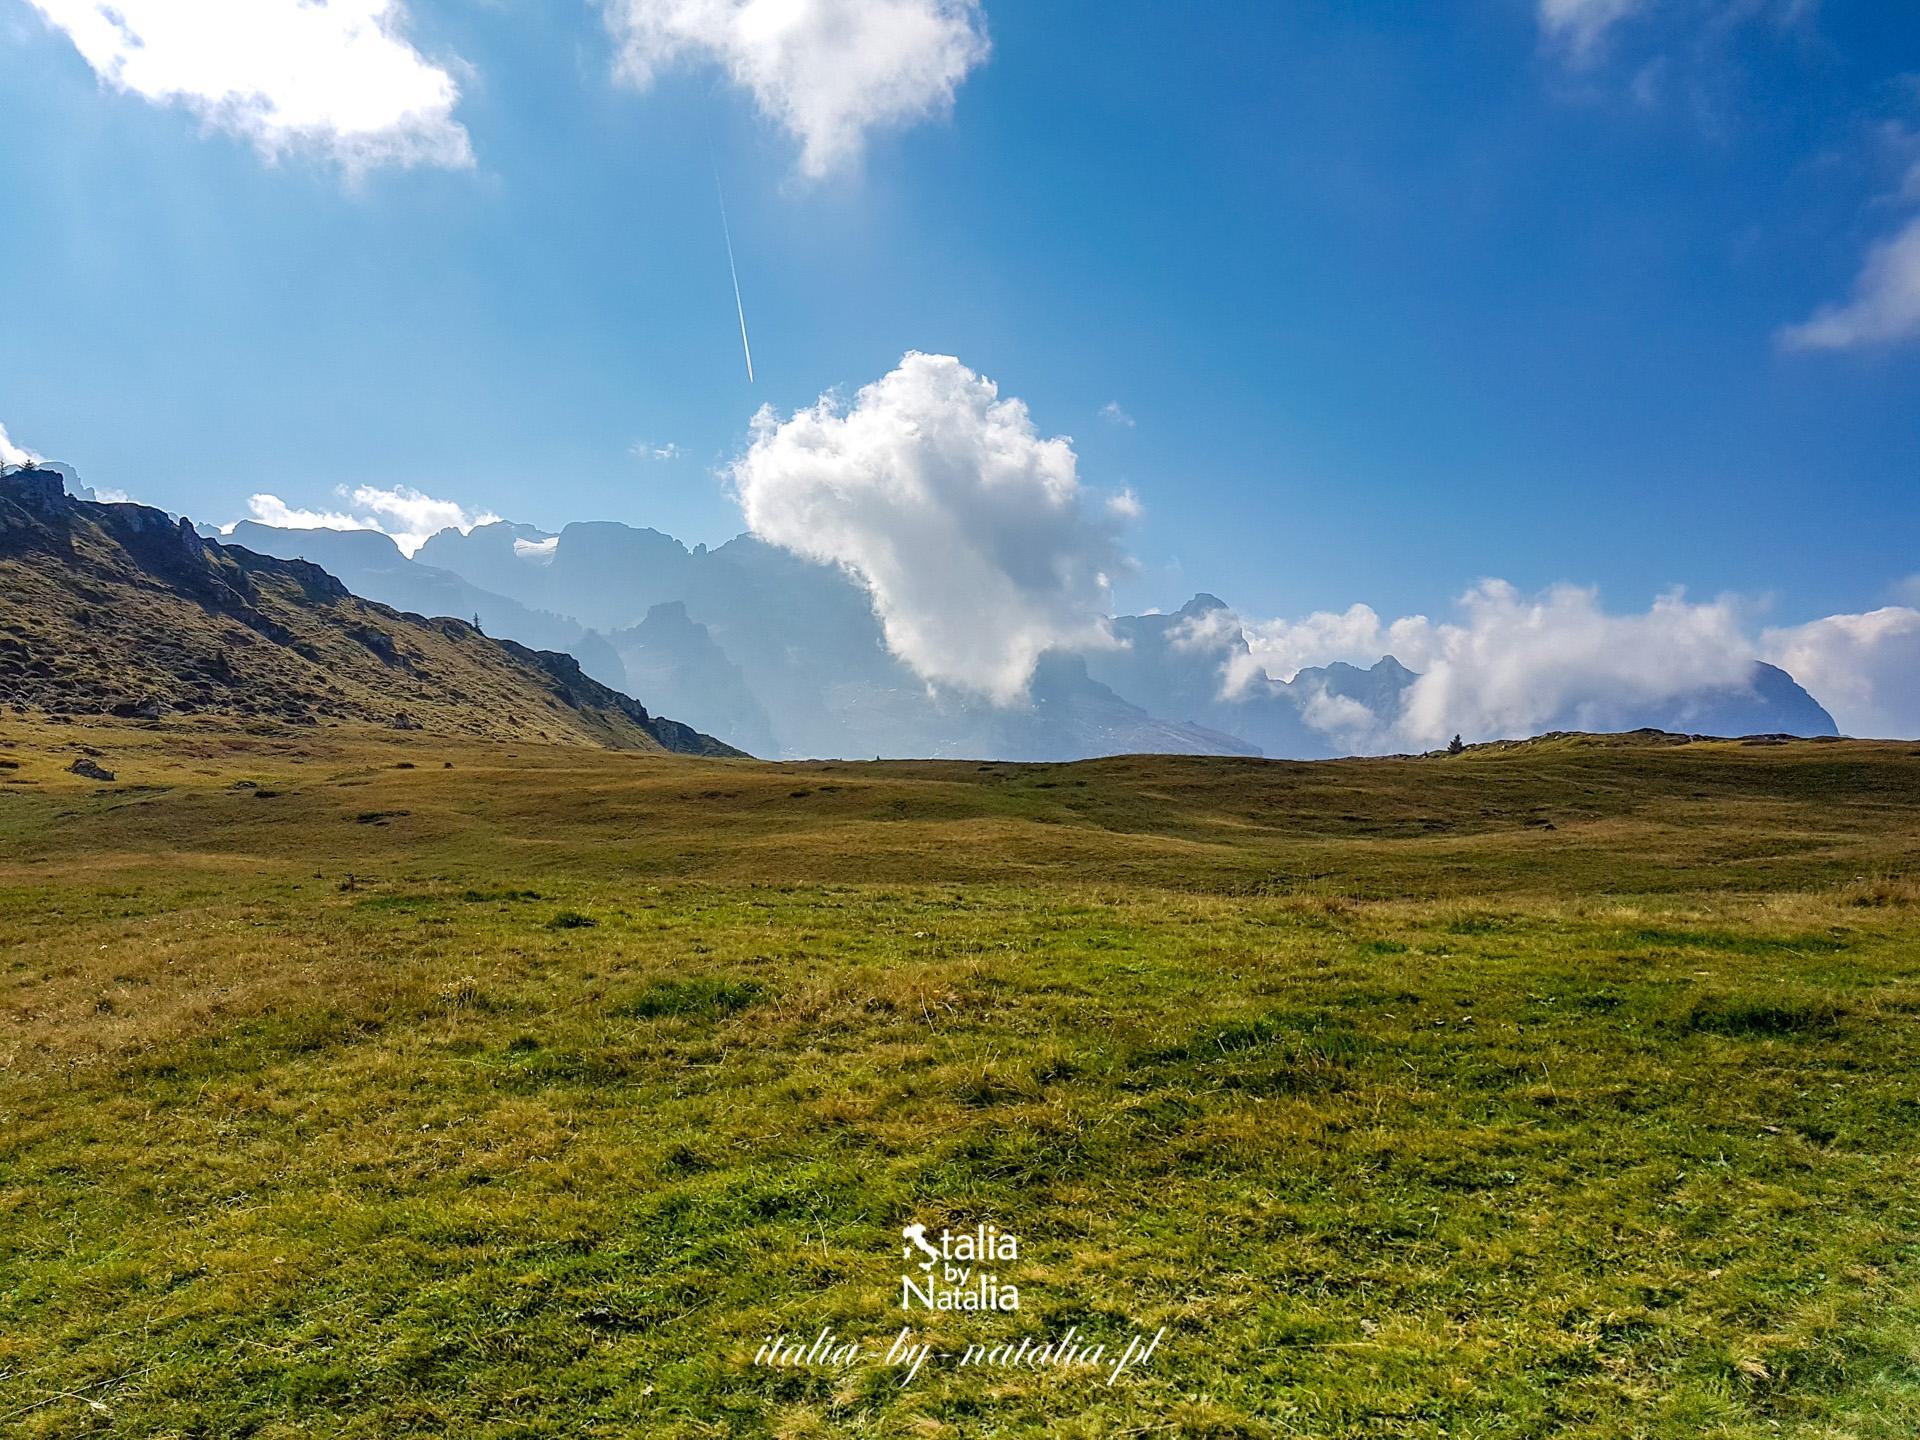 Łatwy szlak w Madonna di Campiglio Dolomity Groste Lago Spinale Monte Spinale Chalet Fiat mapa